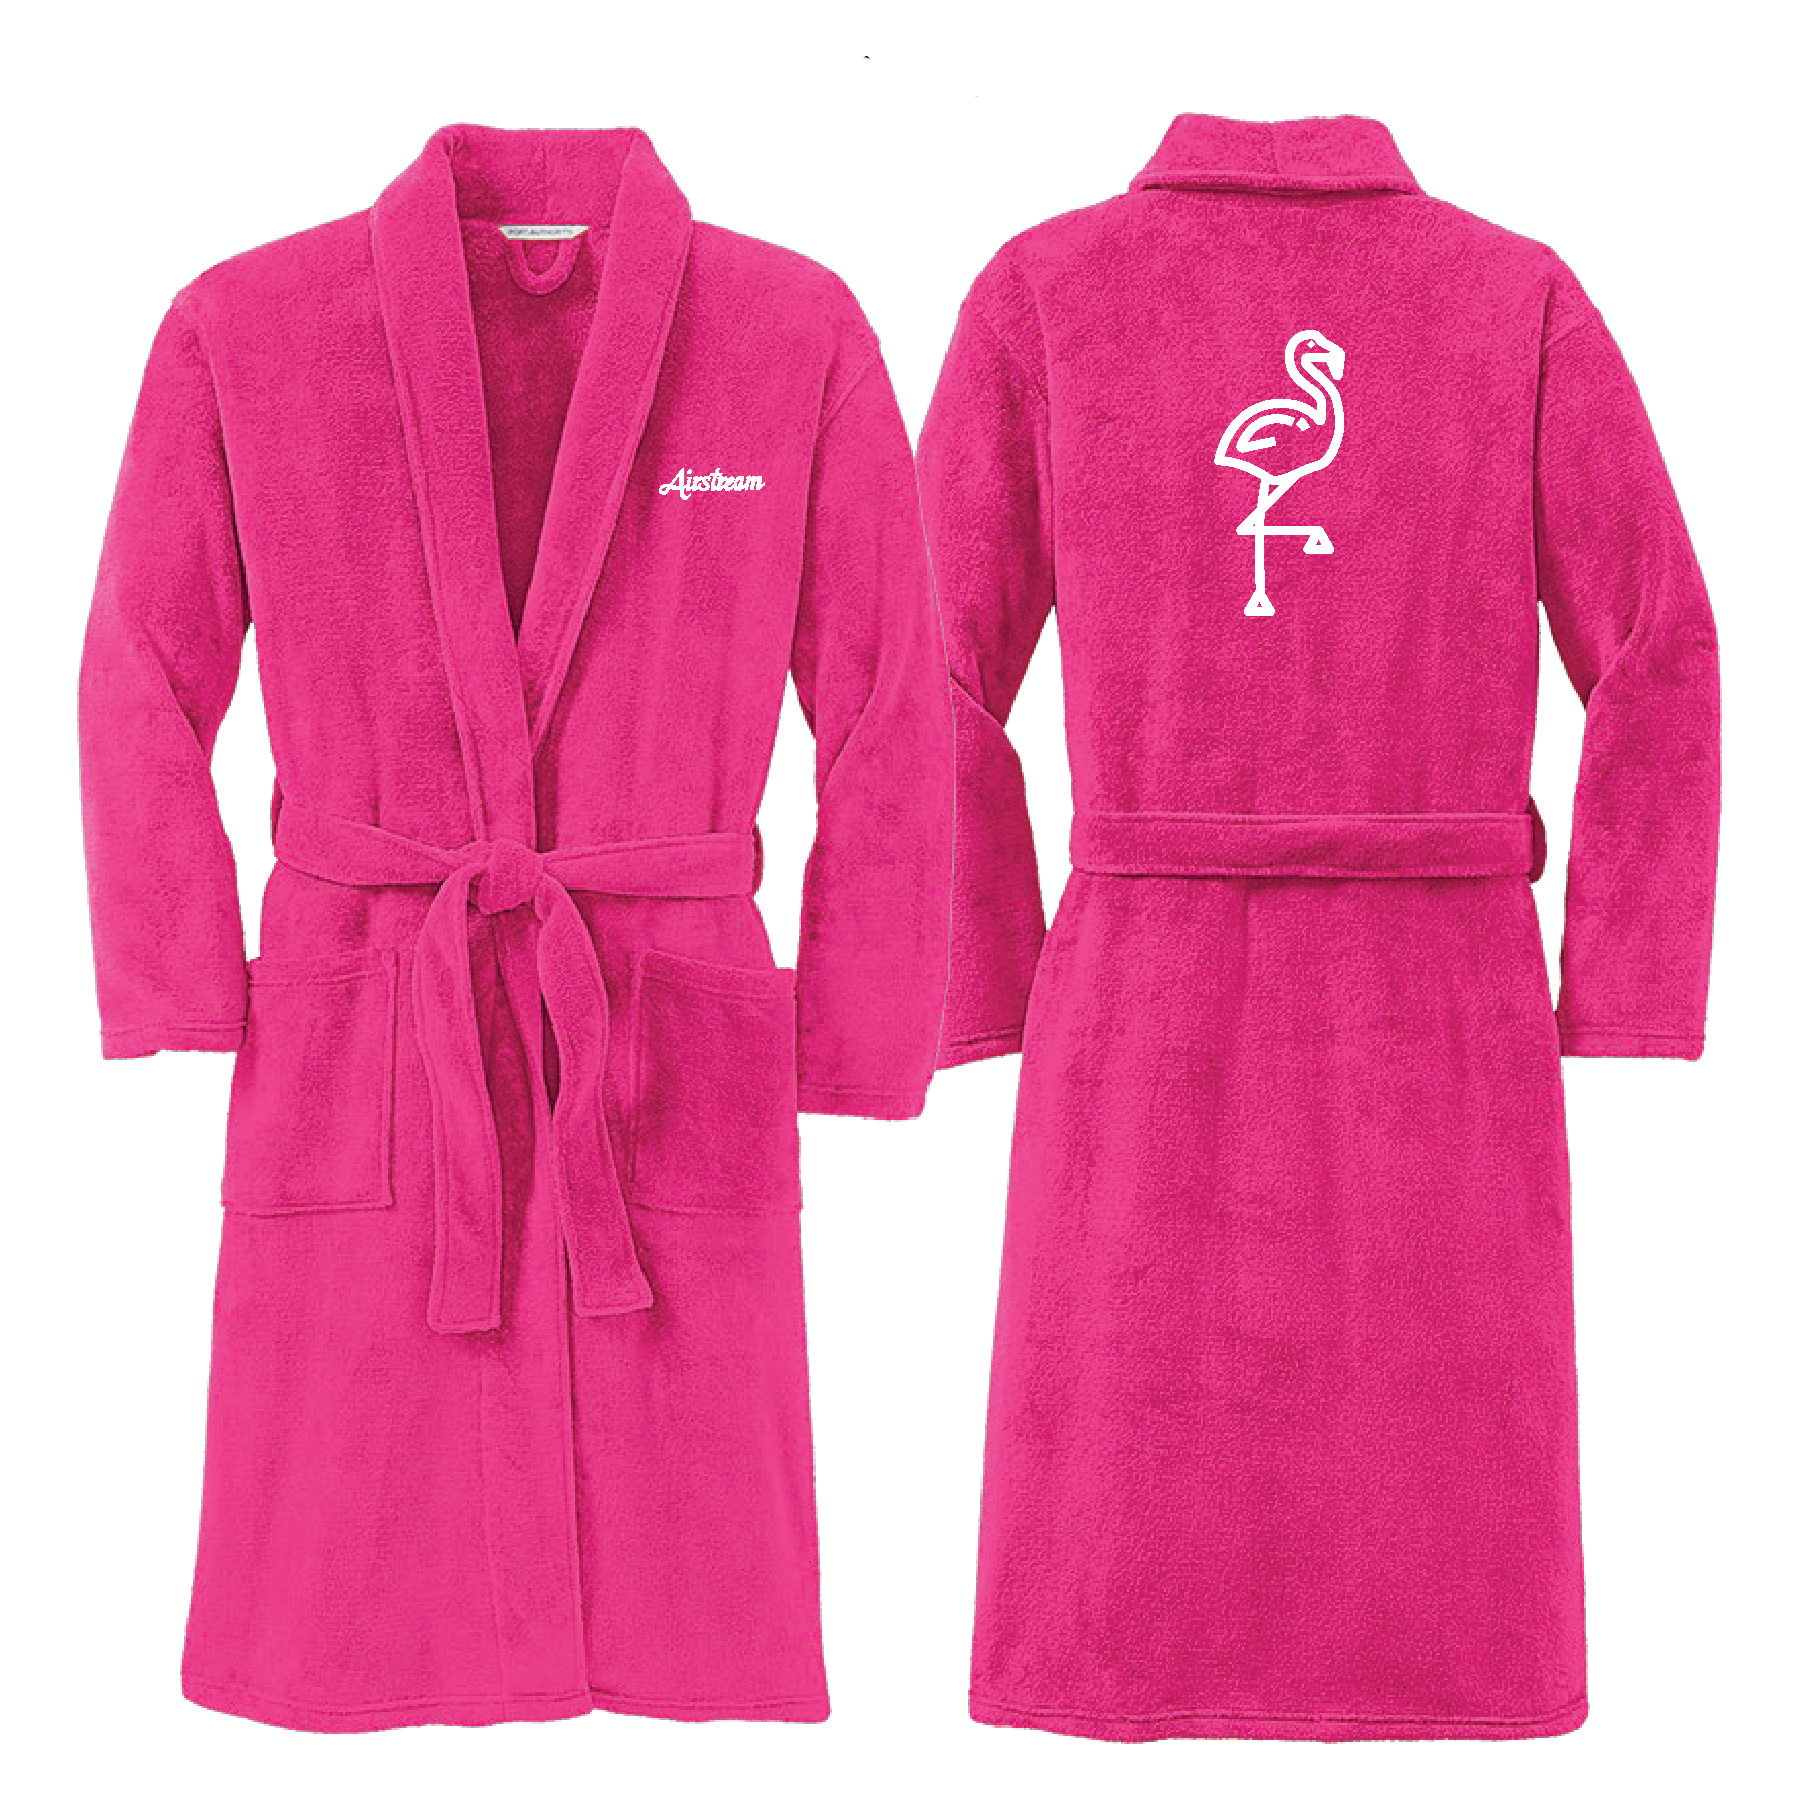 studio eleven robe pink